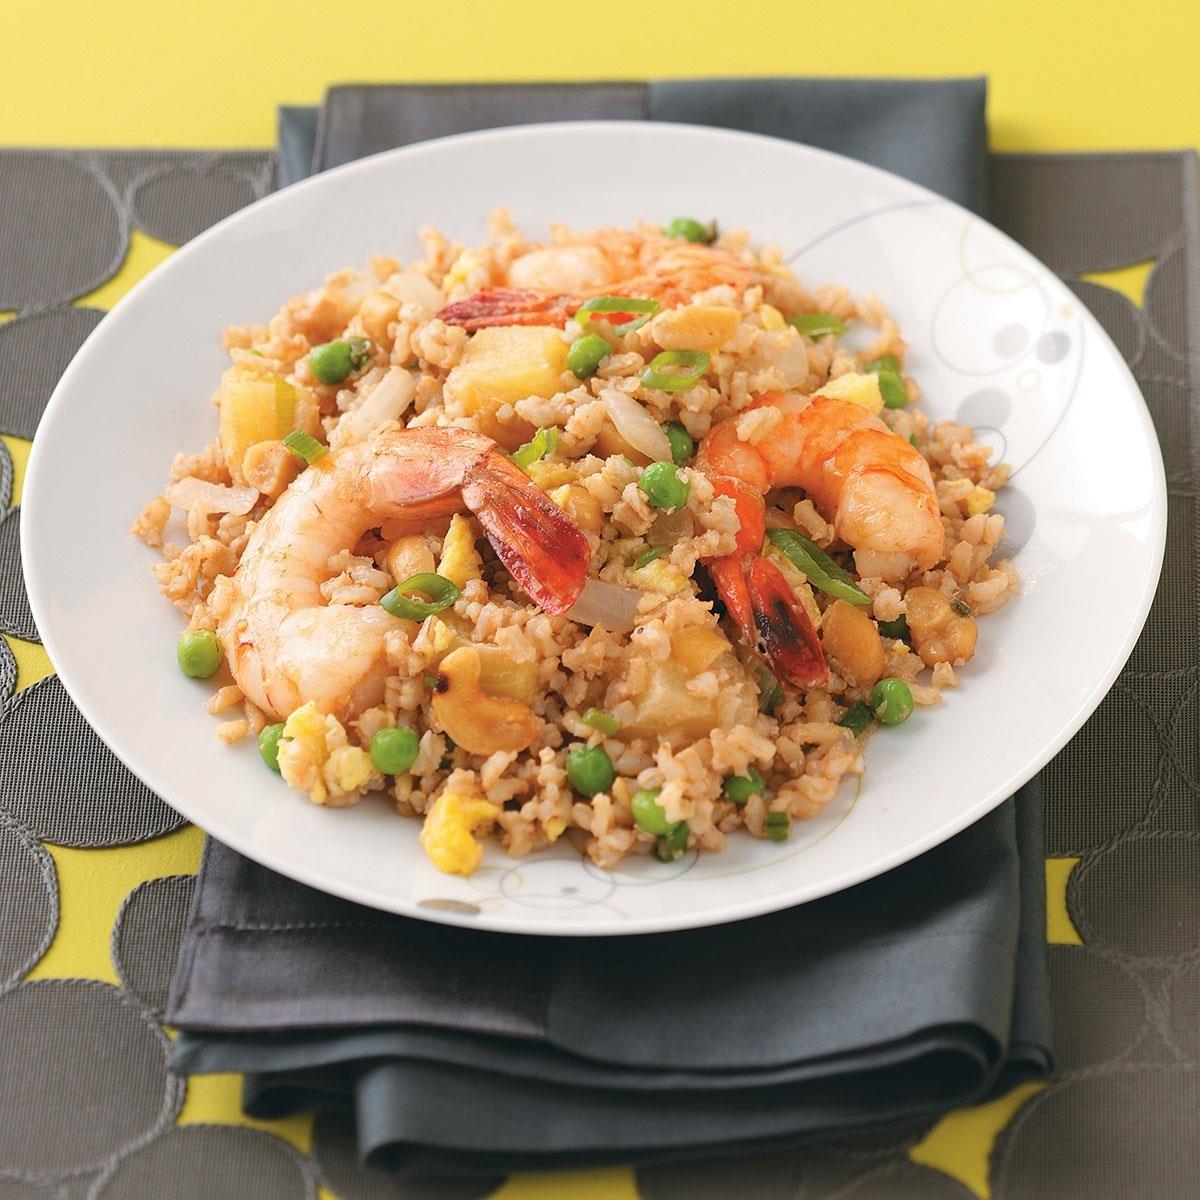 Shrimp and Pineapple Fried Rice Recipe | Taste of Home